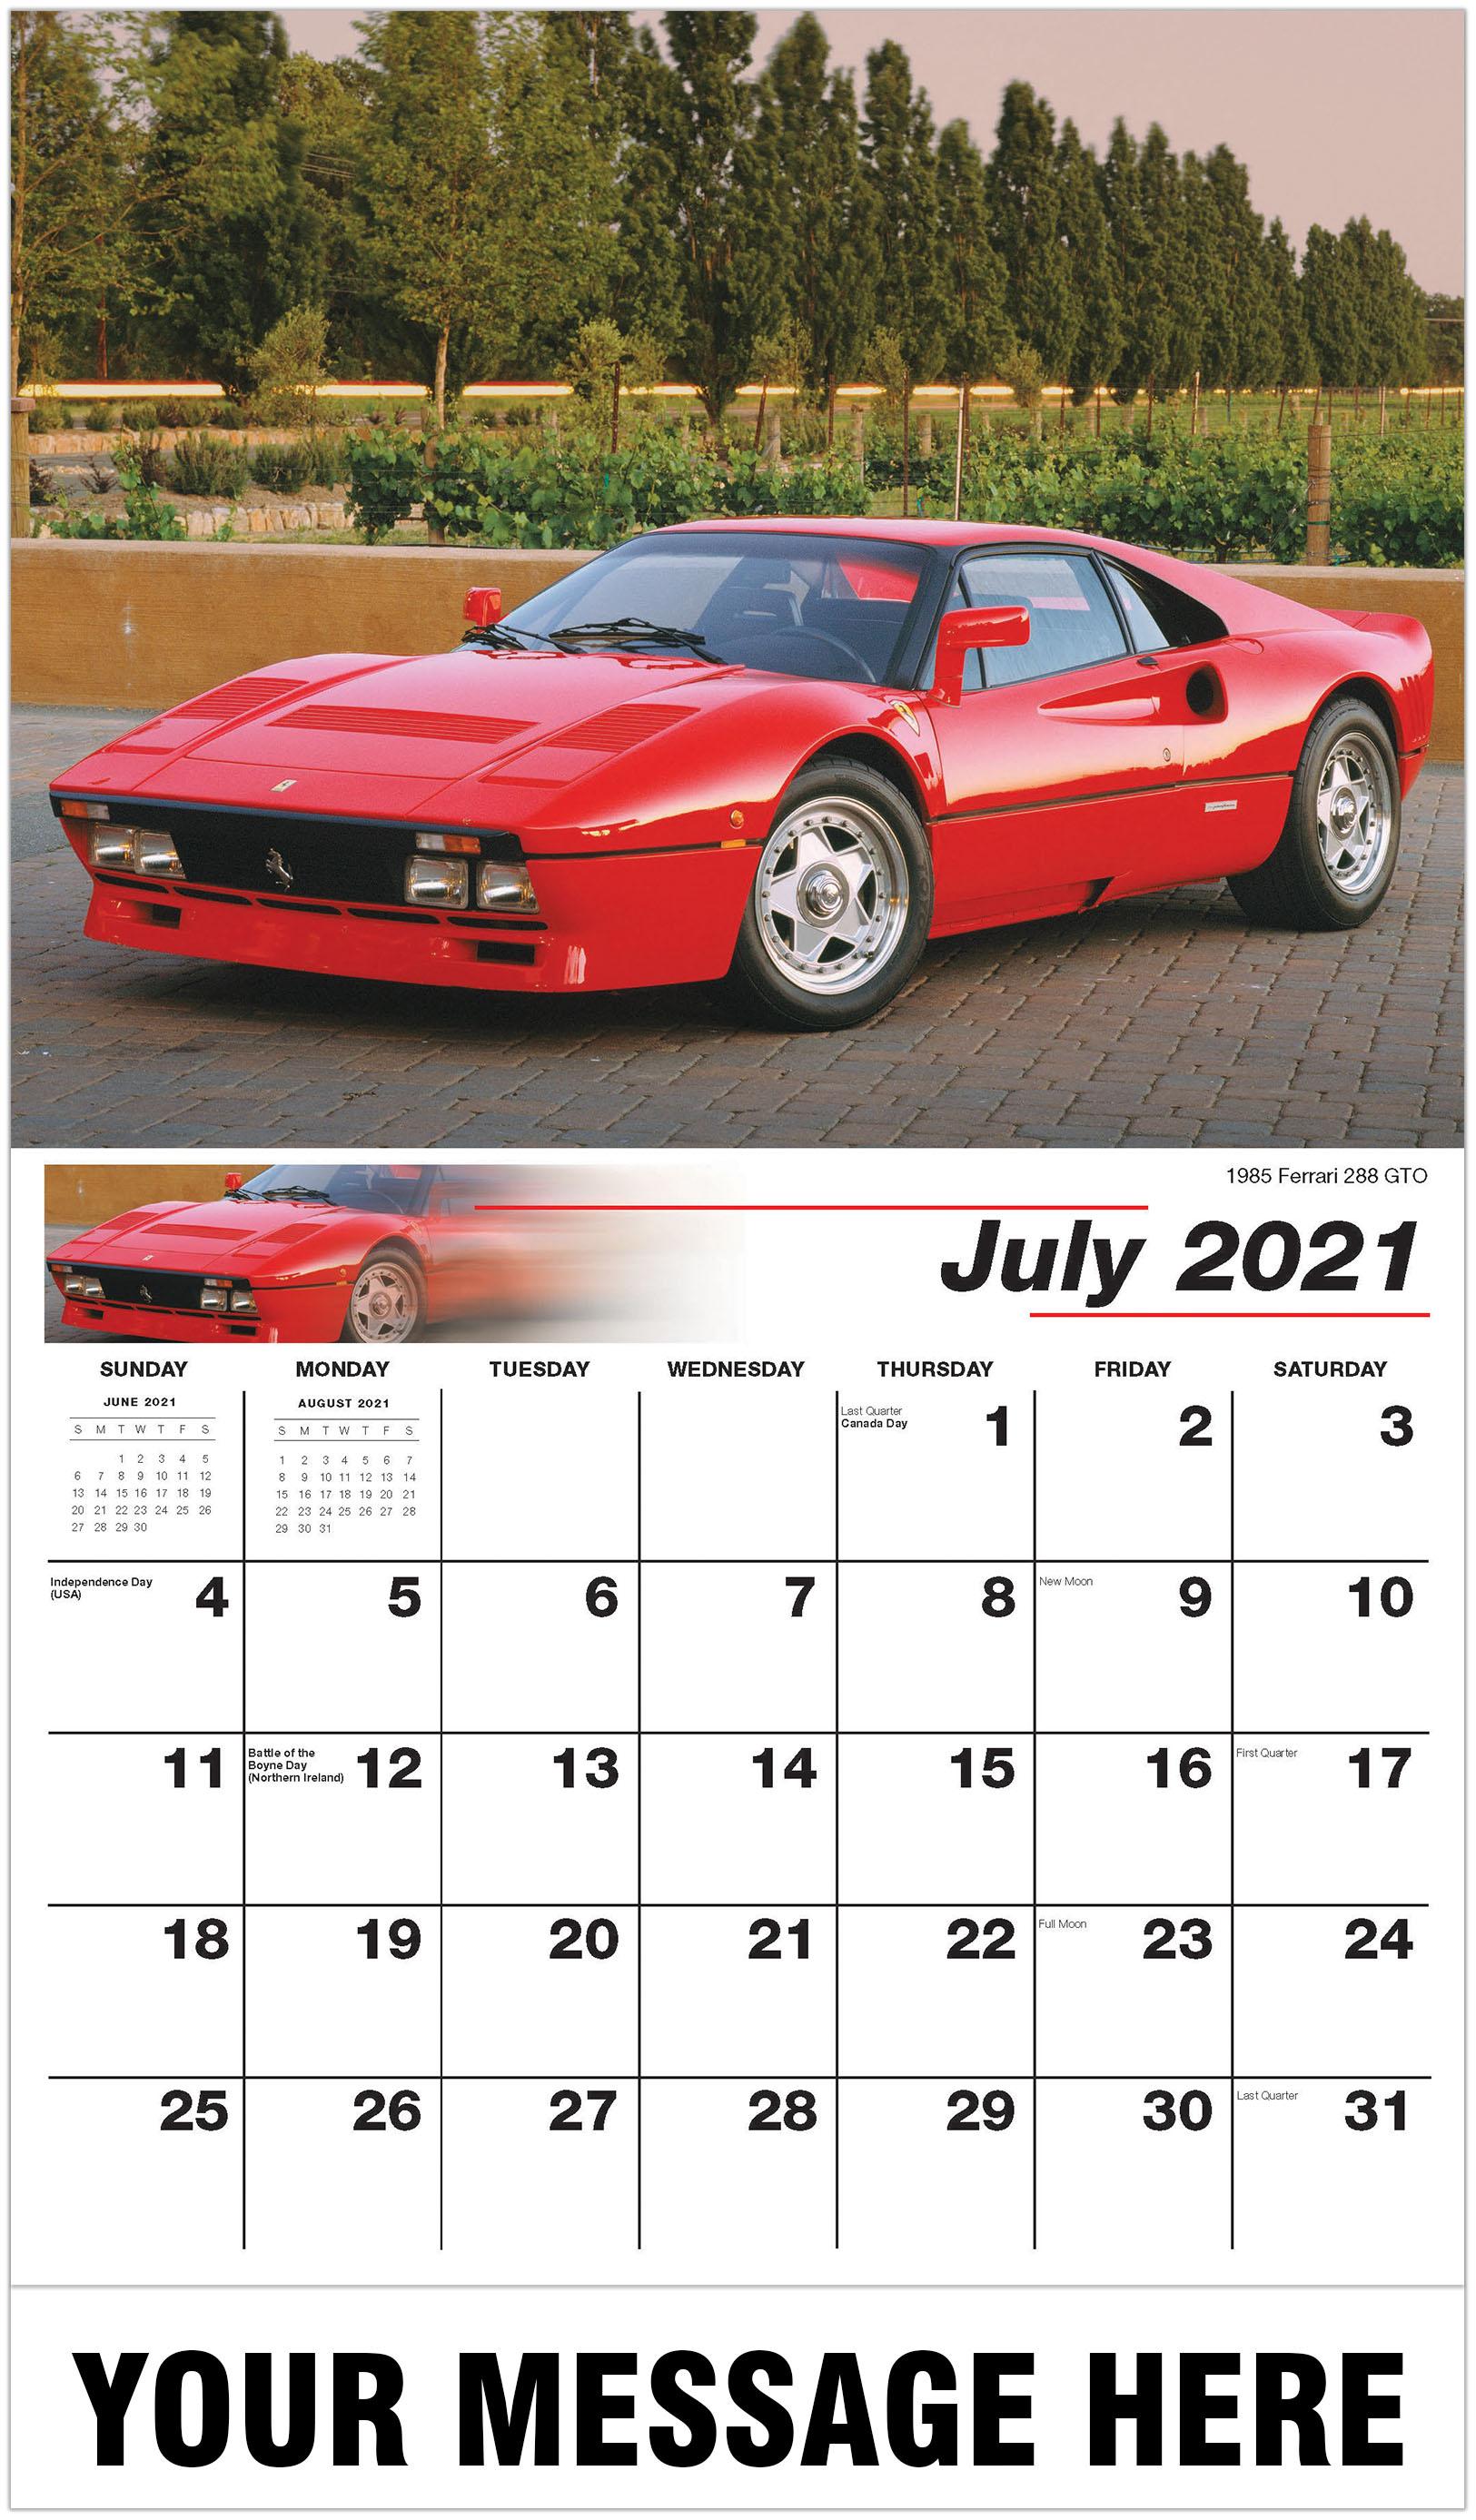 2021 promotional calendar  classic car business promo